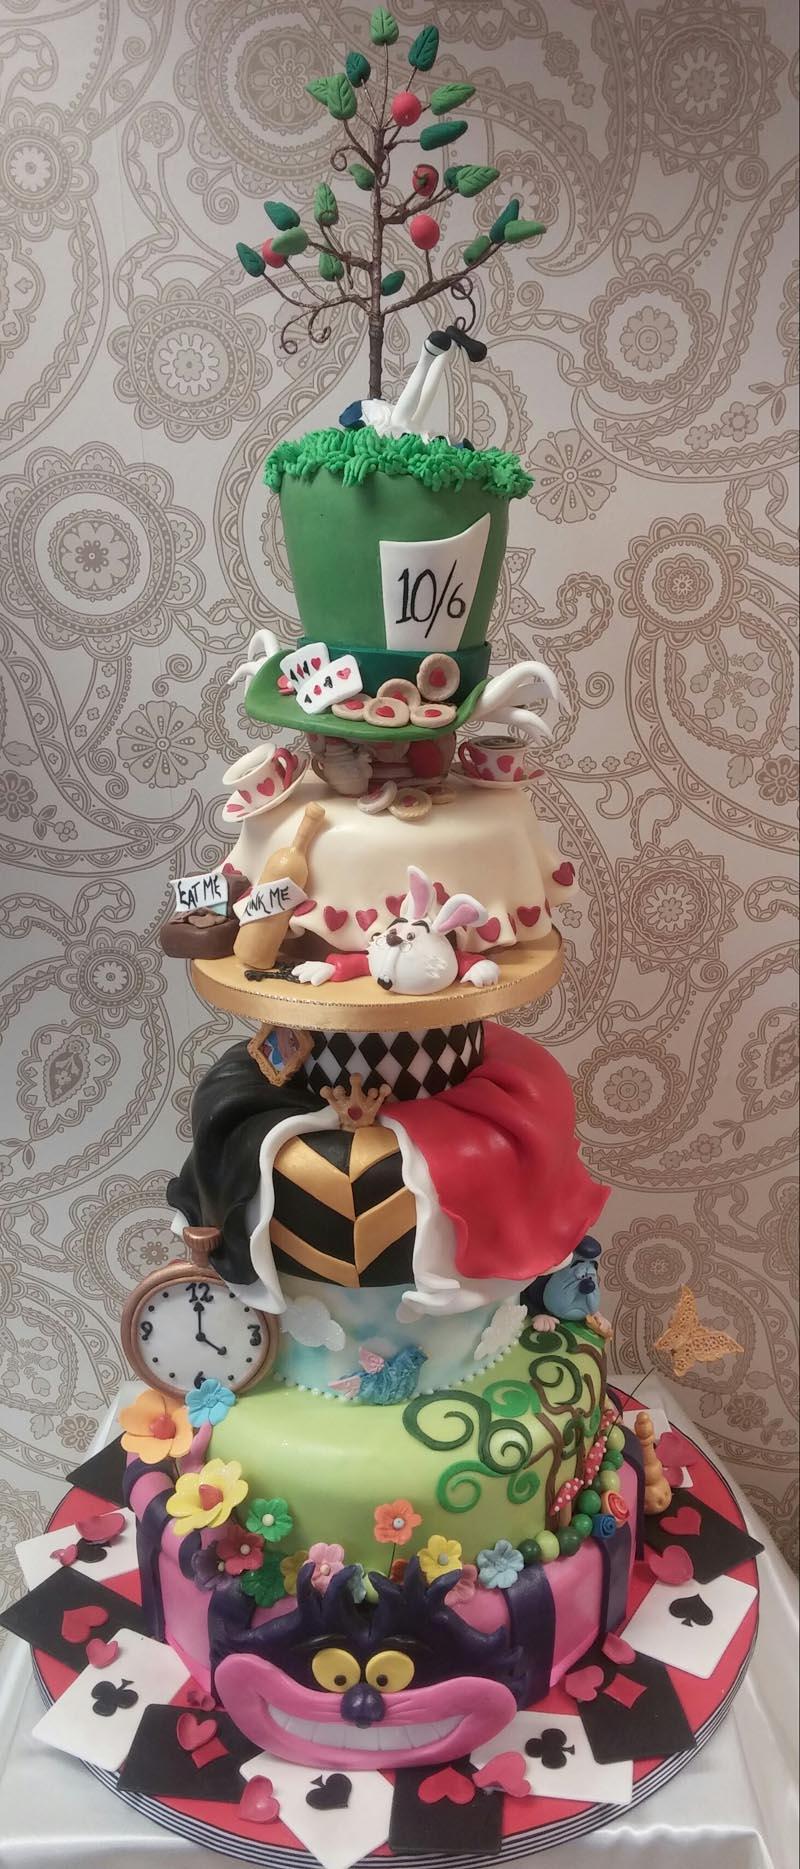 Gorgeous Alice in Wonderland cakes - Alice-in-Wonderland.net blog